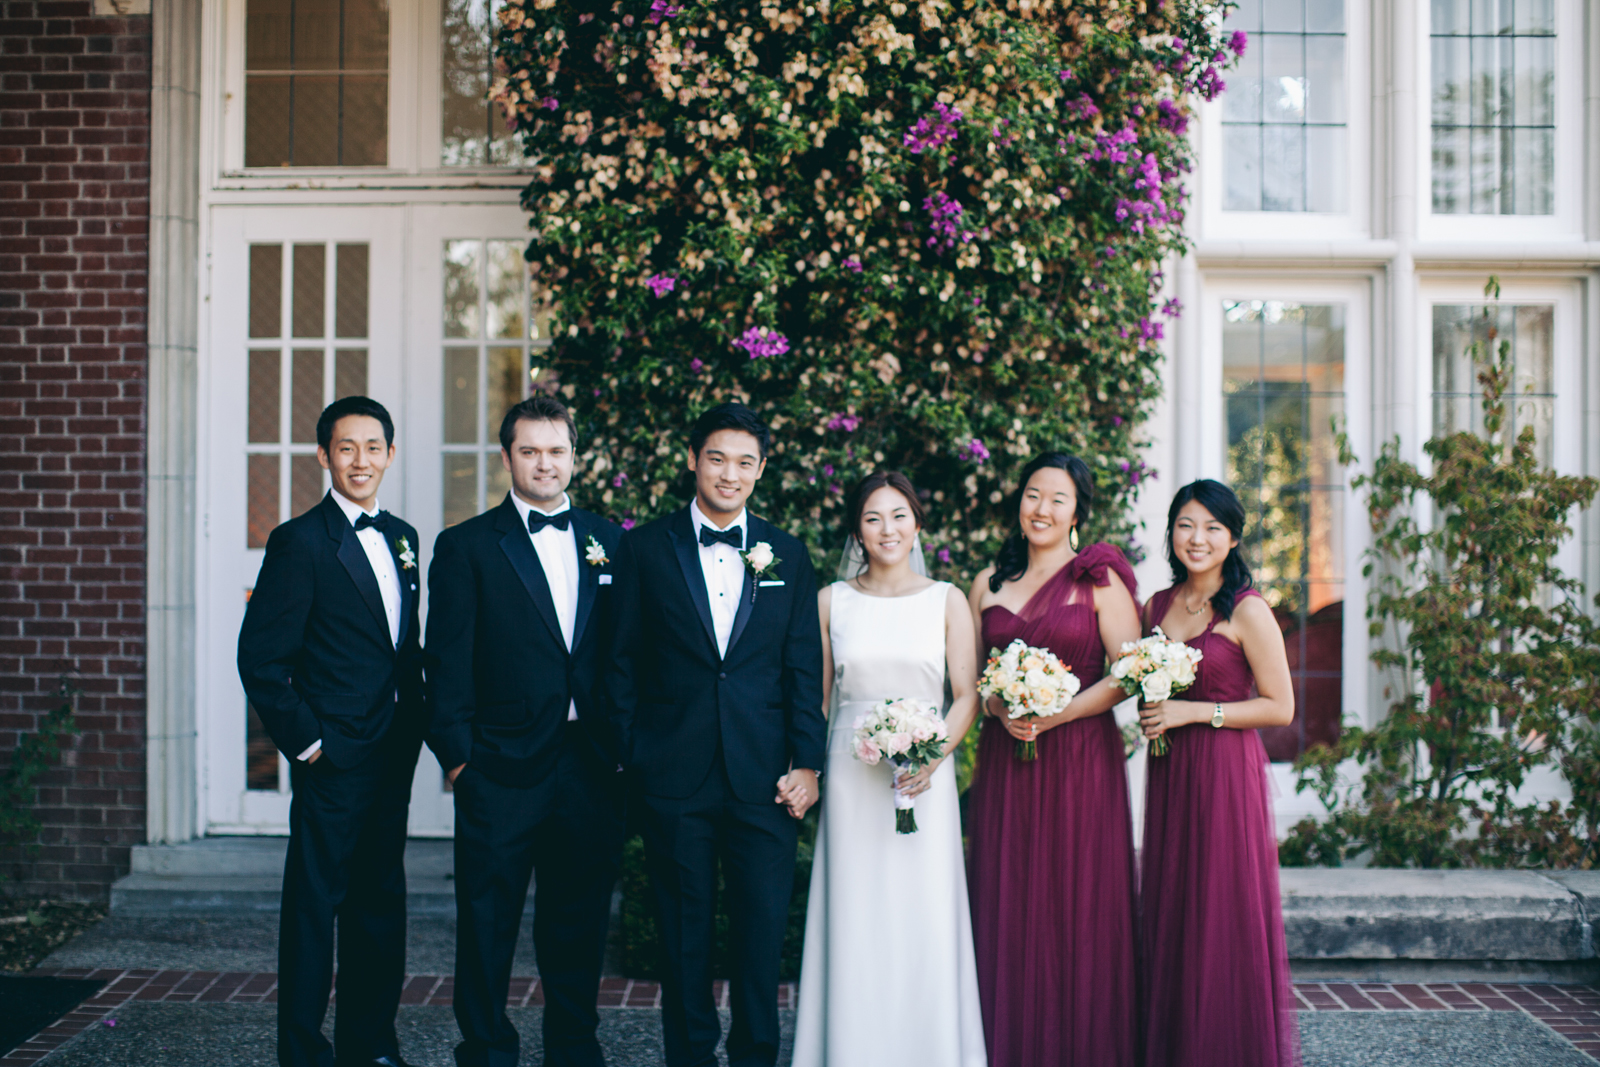 kohl_manison_wedding_photography_sarah_eric_ebony_siovhan_bokeh_photography_022.jpg